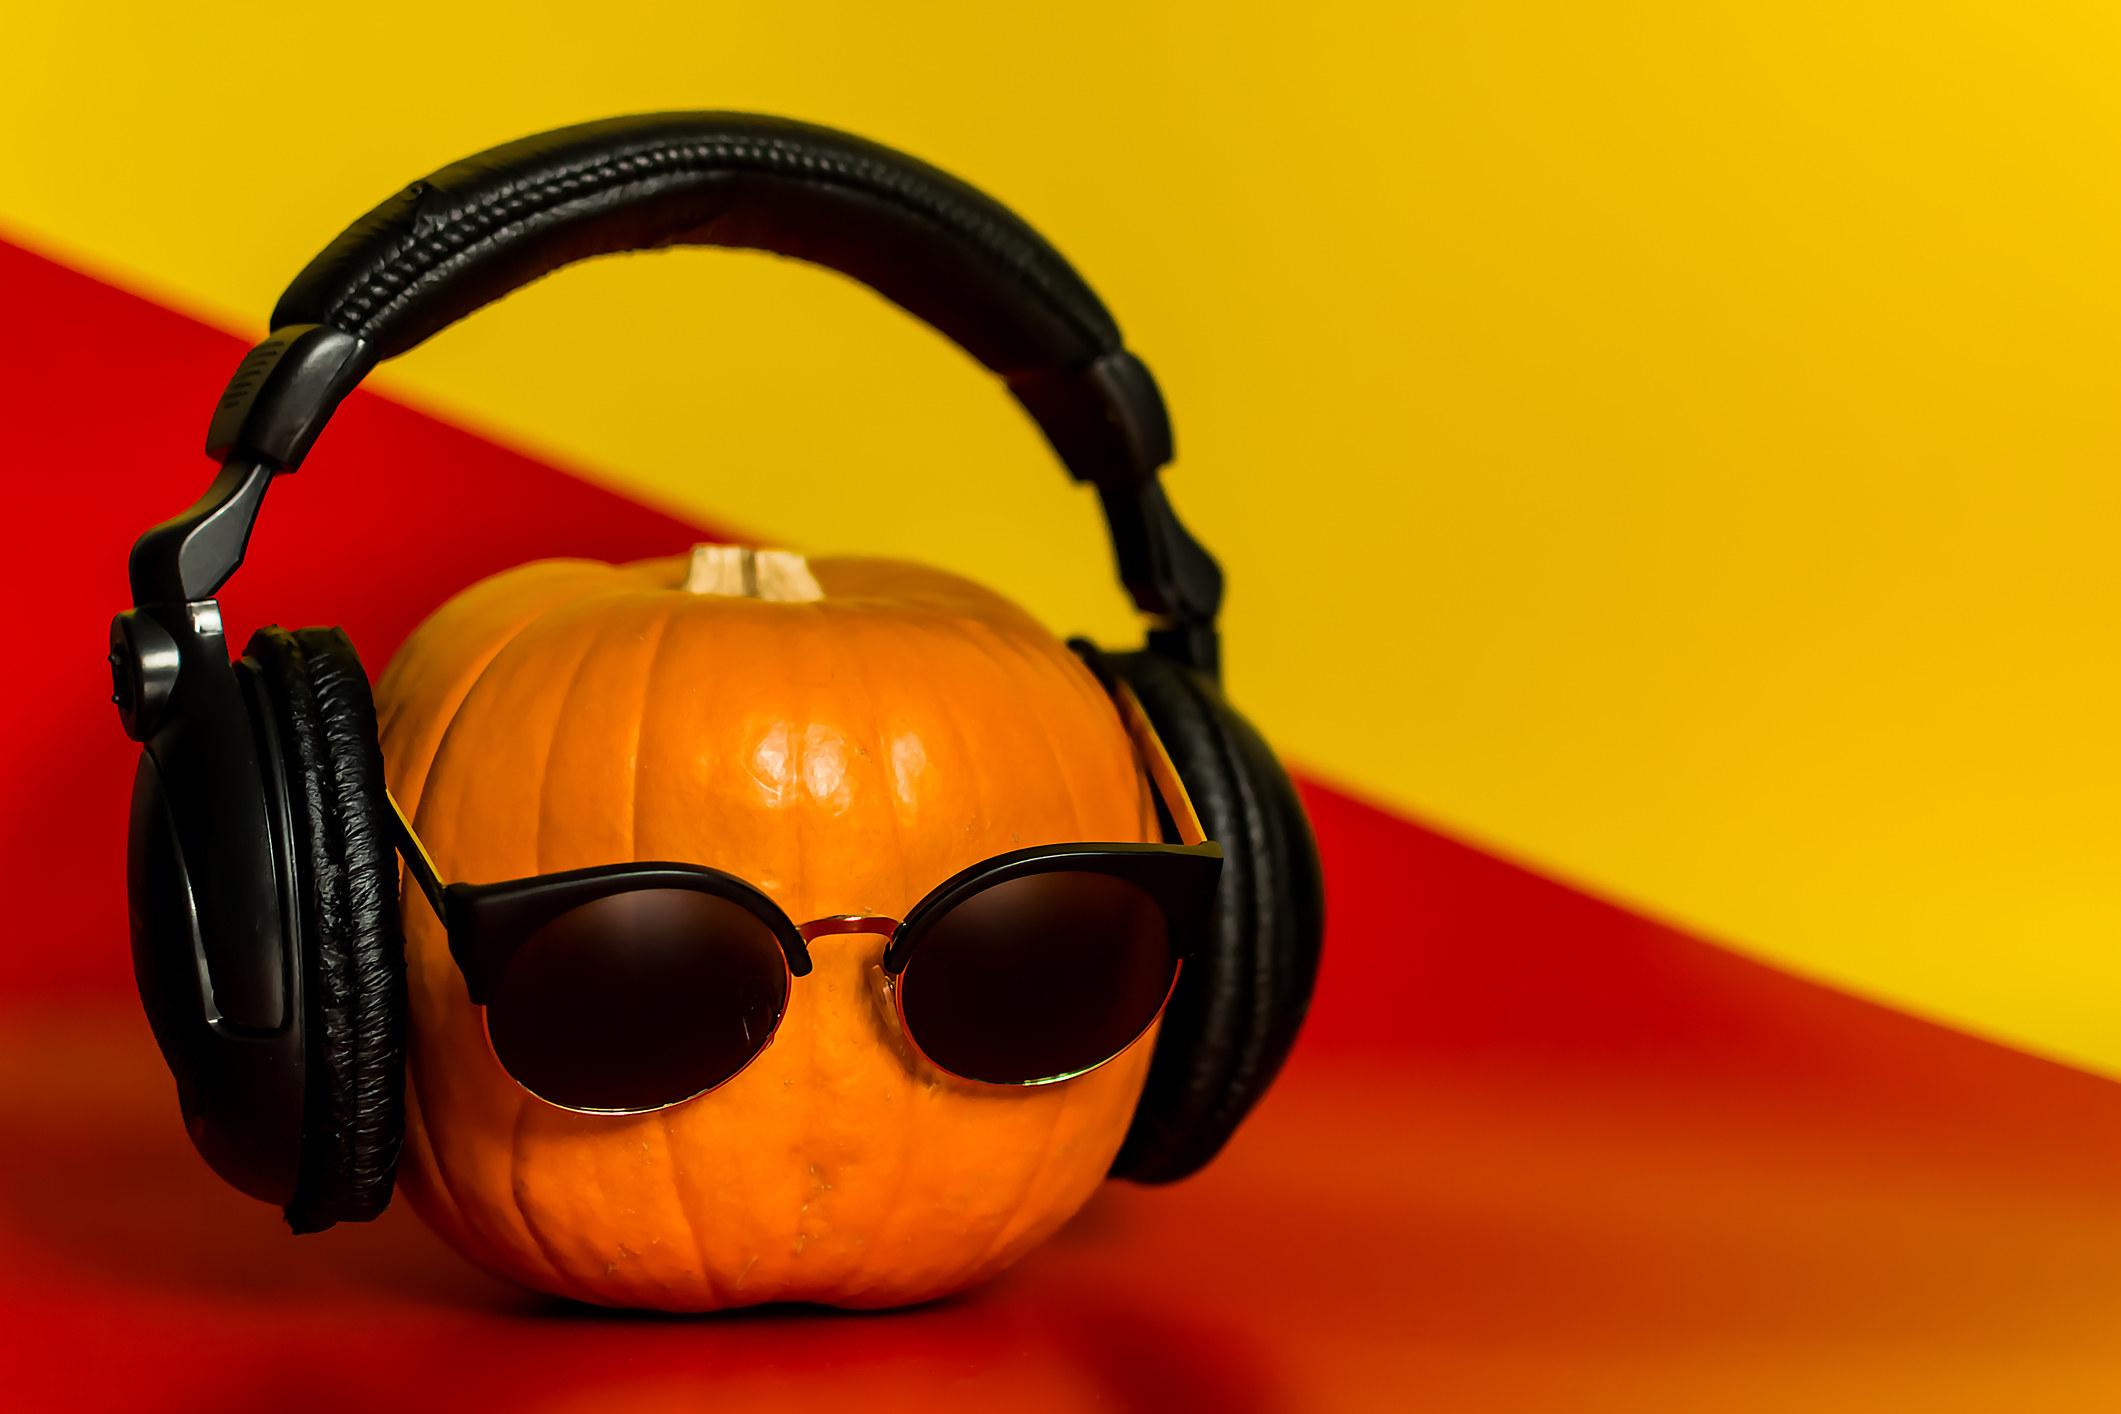 A pumpkin with headphones on.